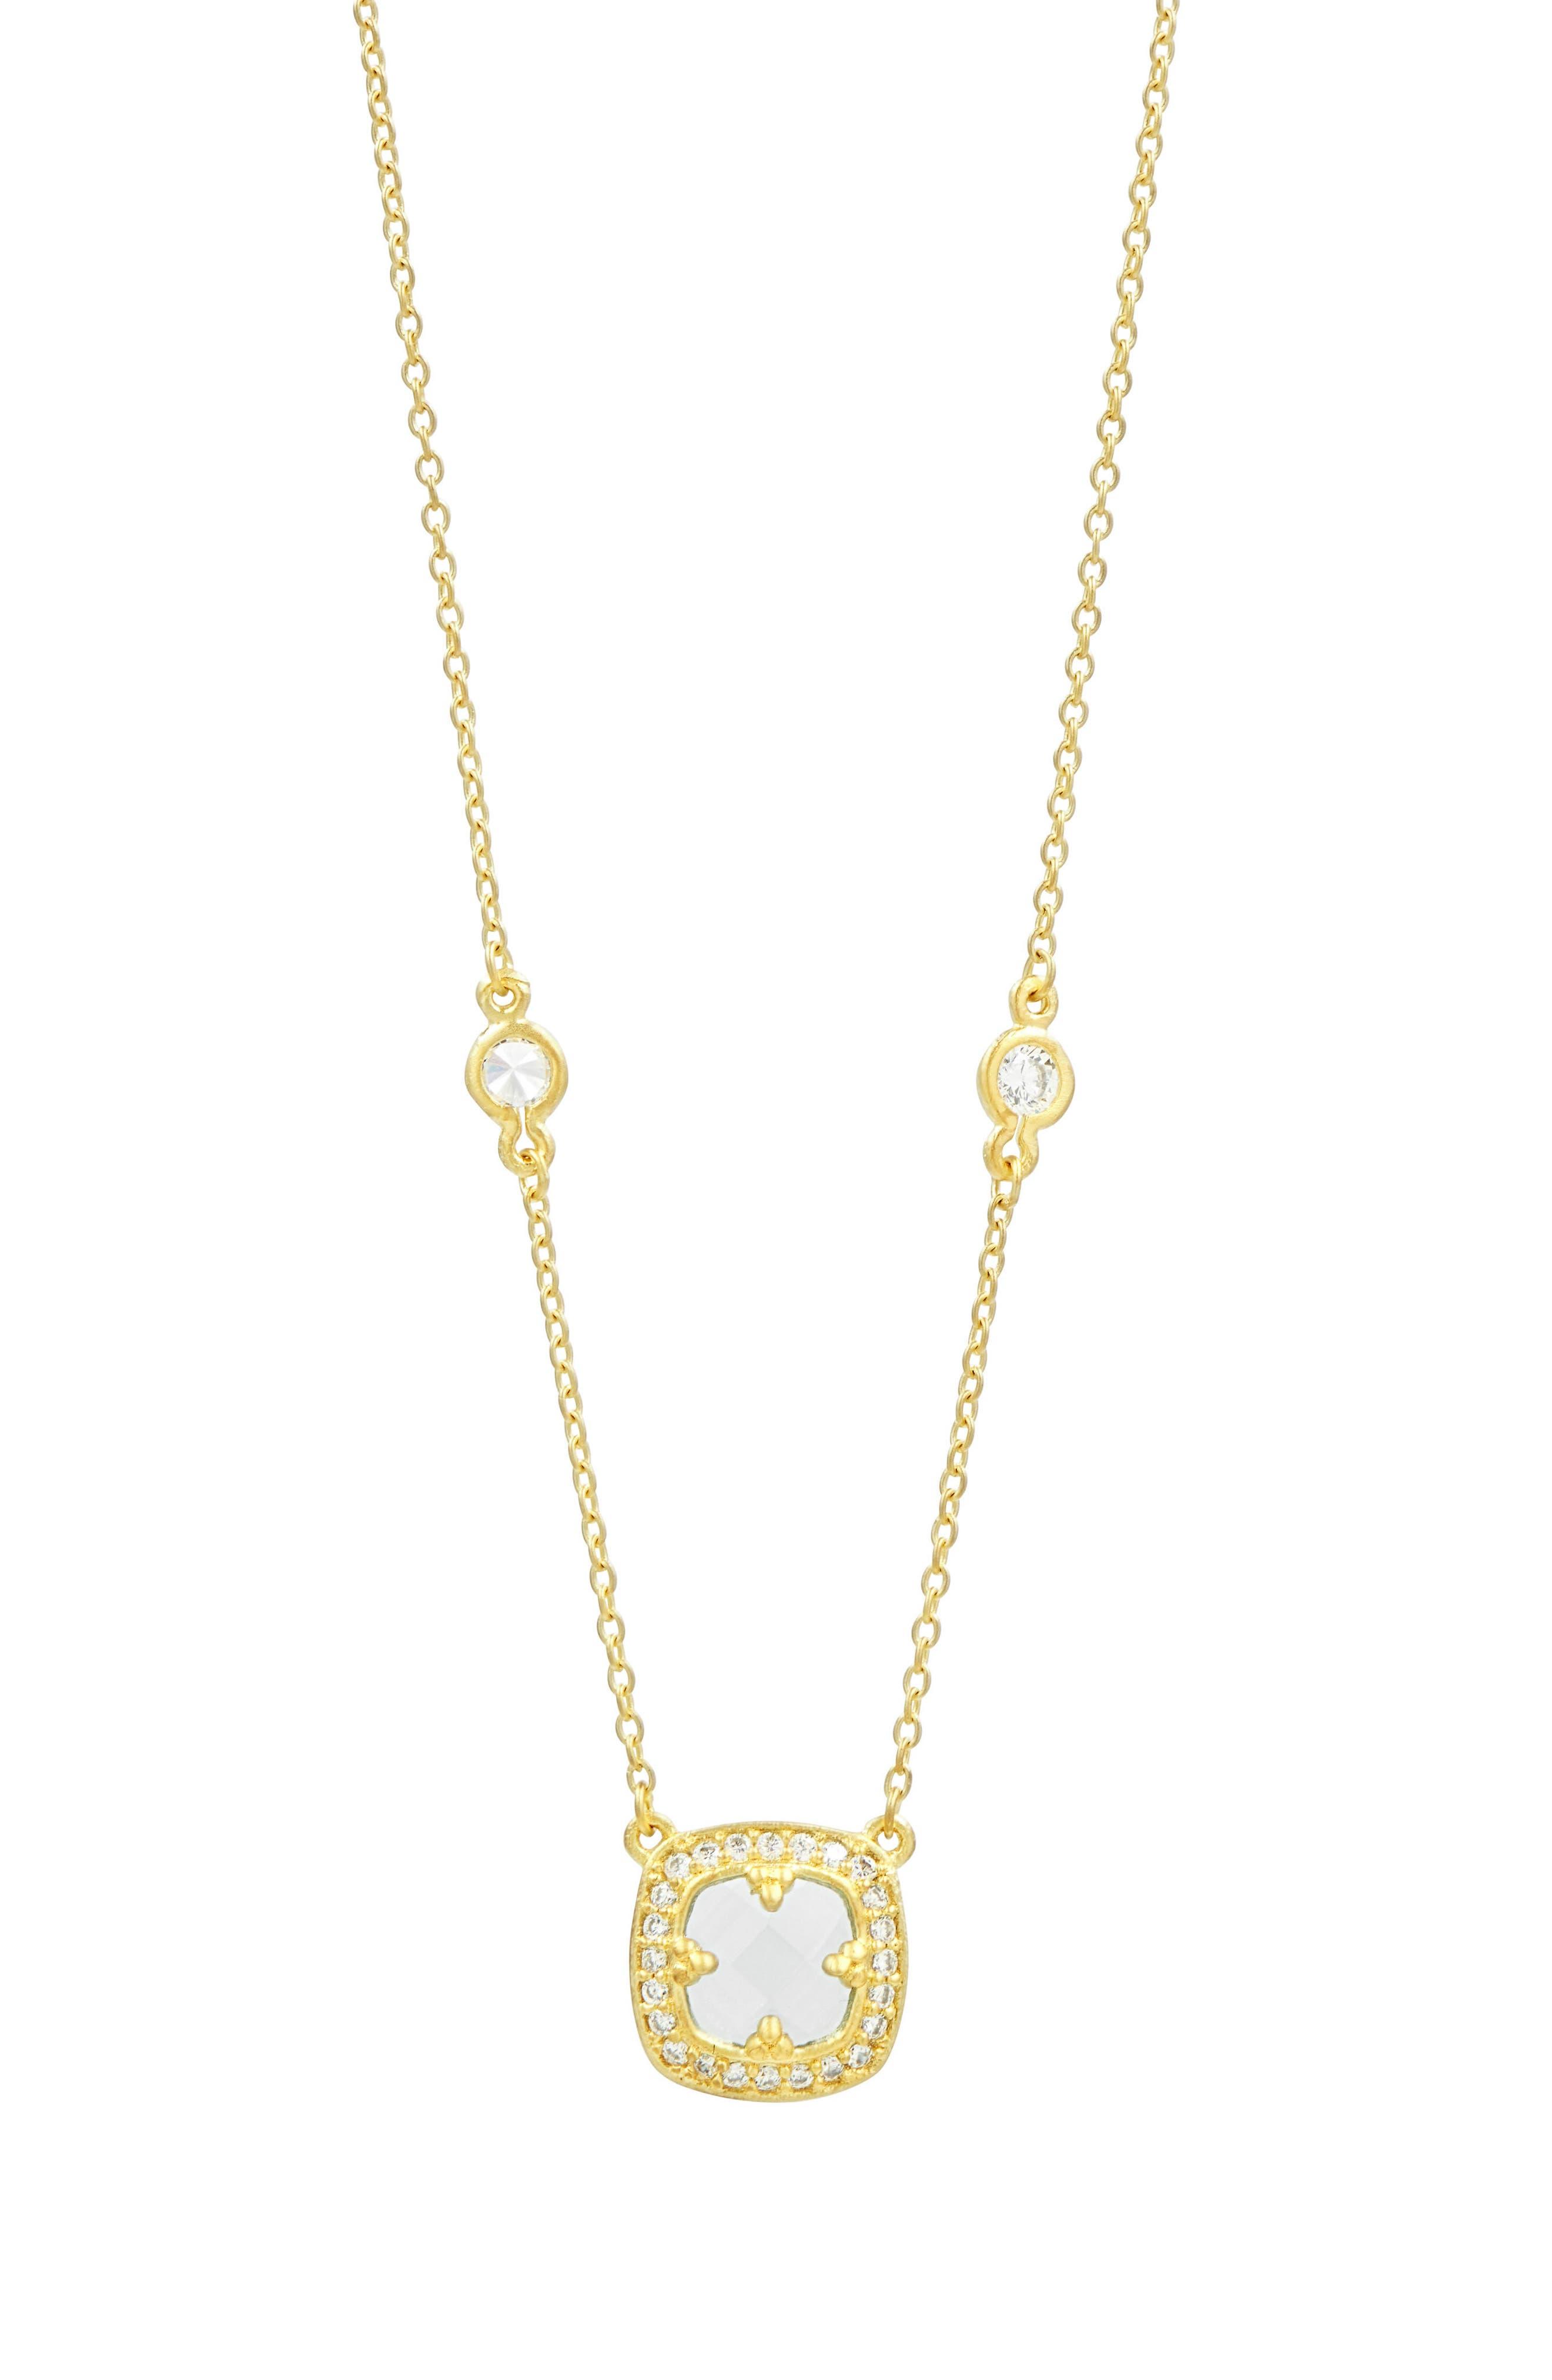 Main Image - FREIDA ROTHMAN Ocean Azure Cubic Zirconia Pendant Necklace